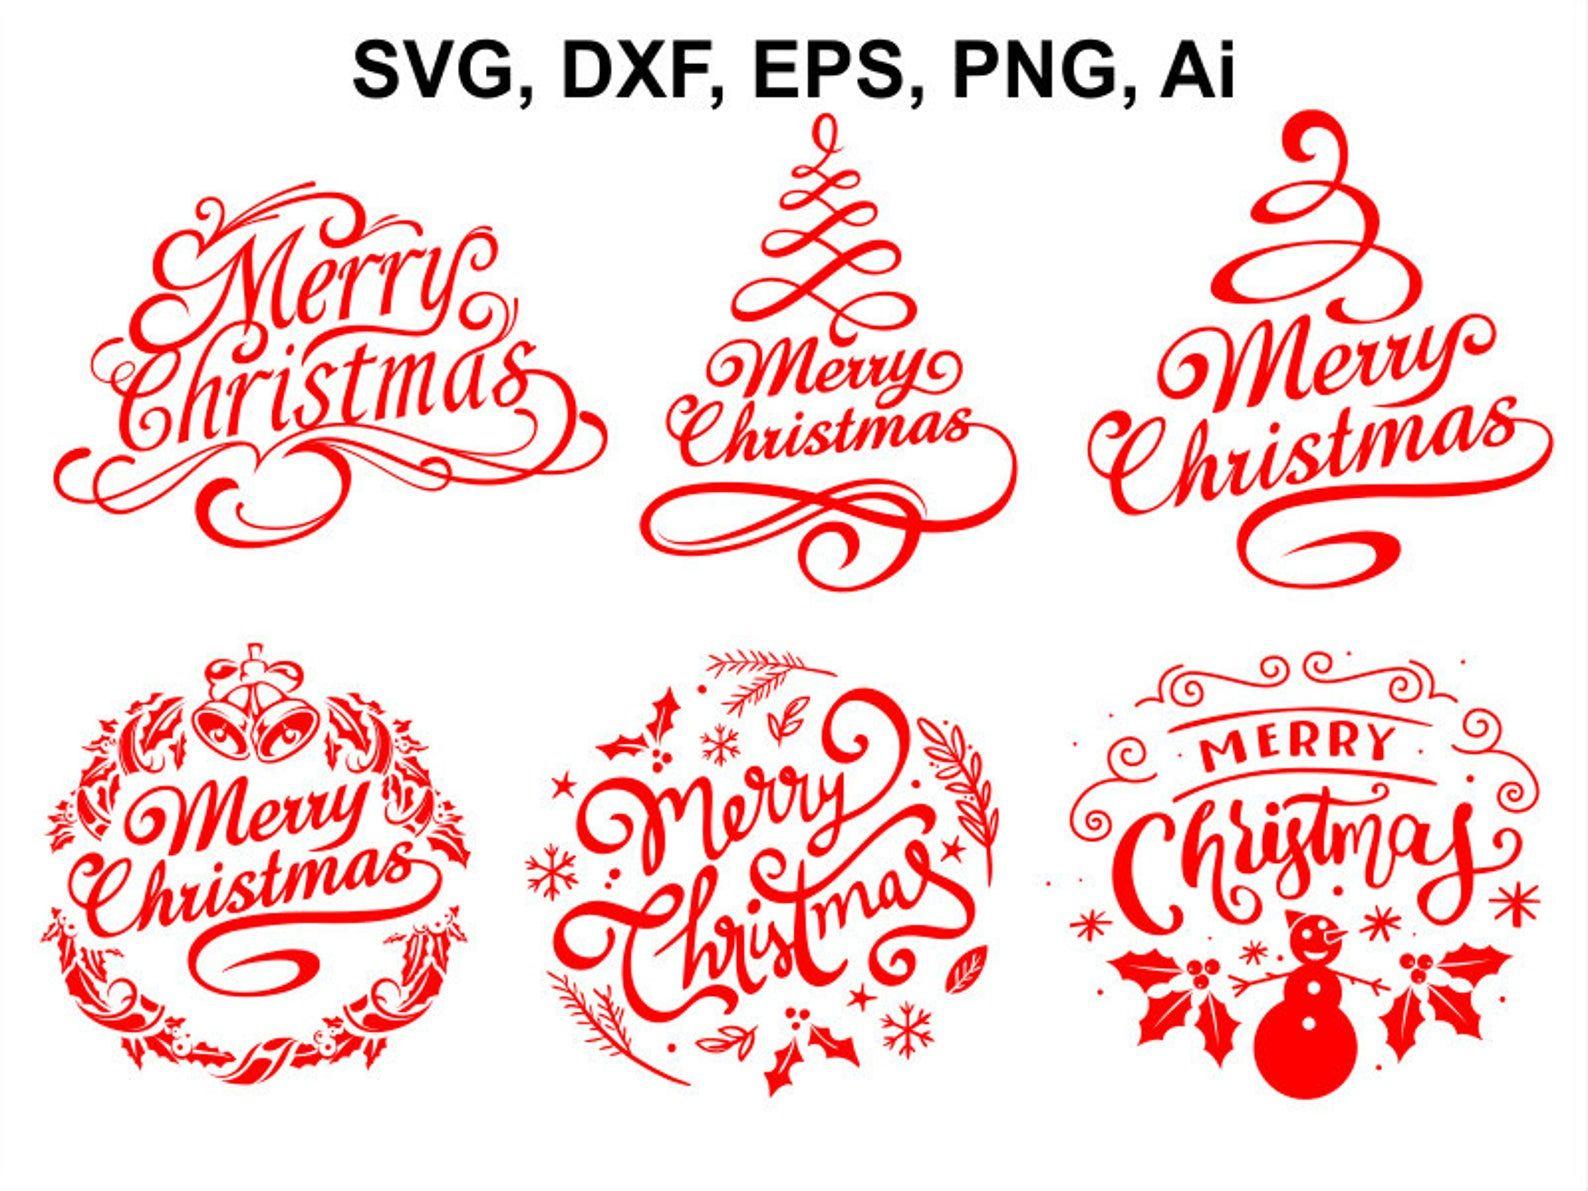 Merry Christmas 2020 Svg Merry Christmas SVG Kerstmis SVG bestand Kerstmis clipart | Etsy